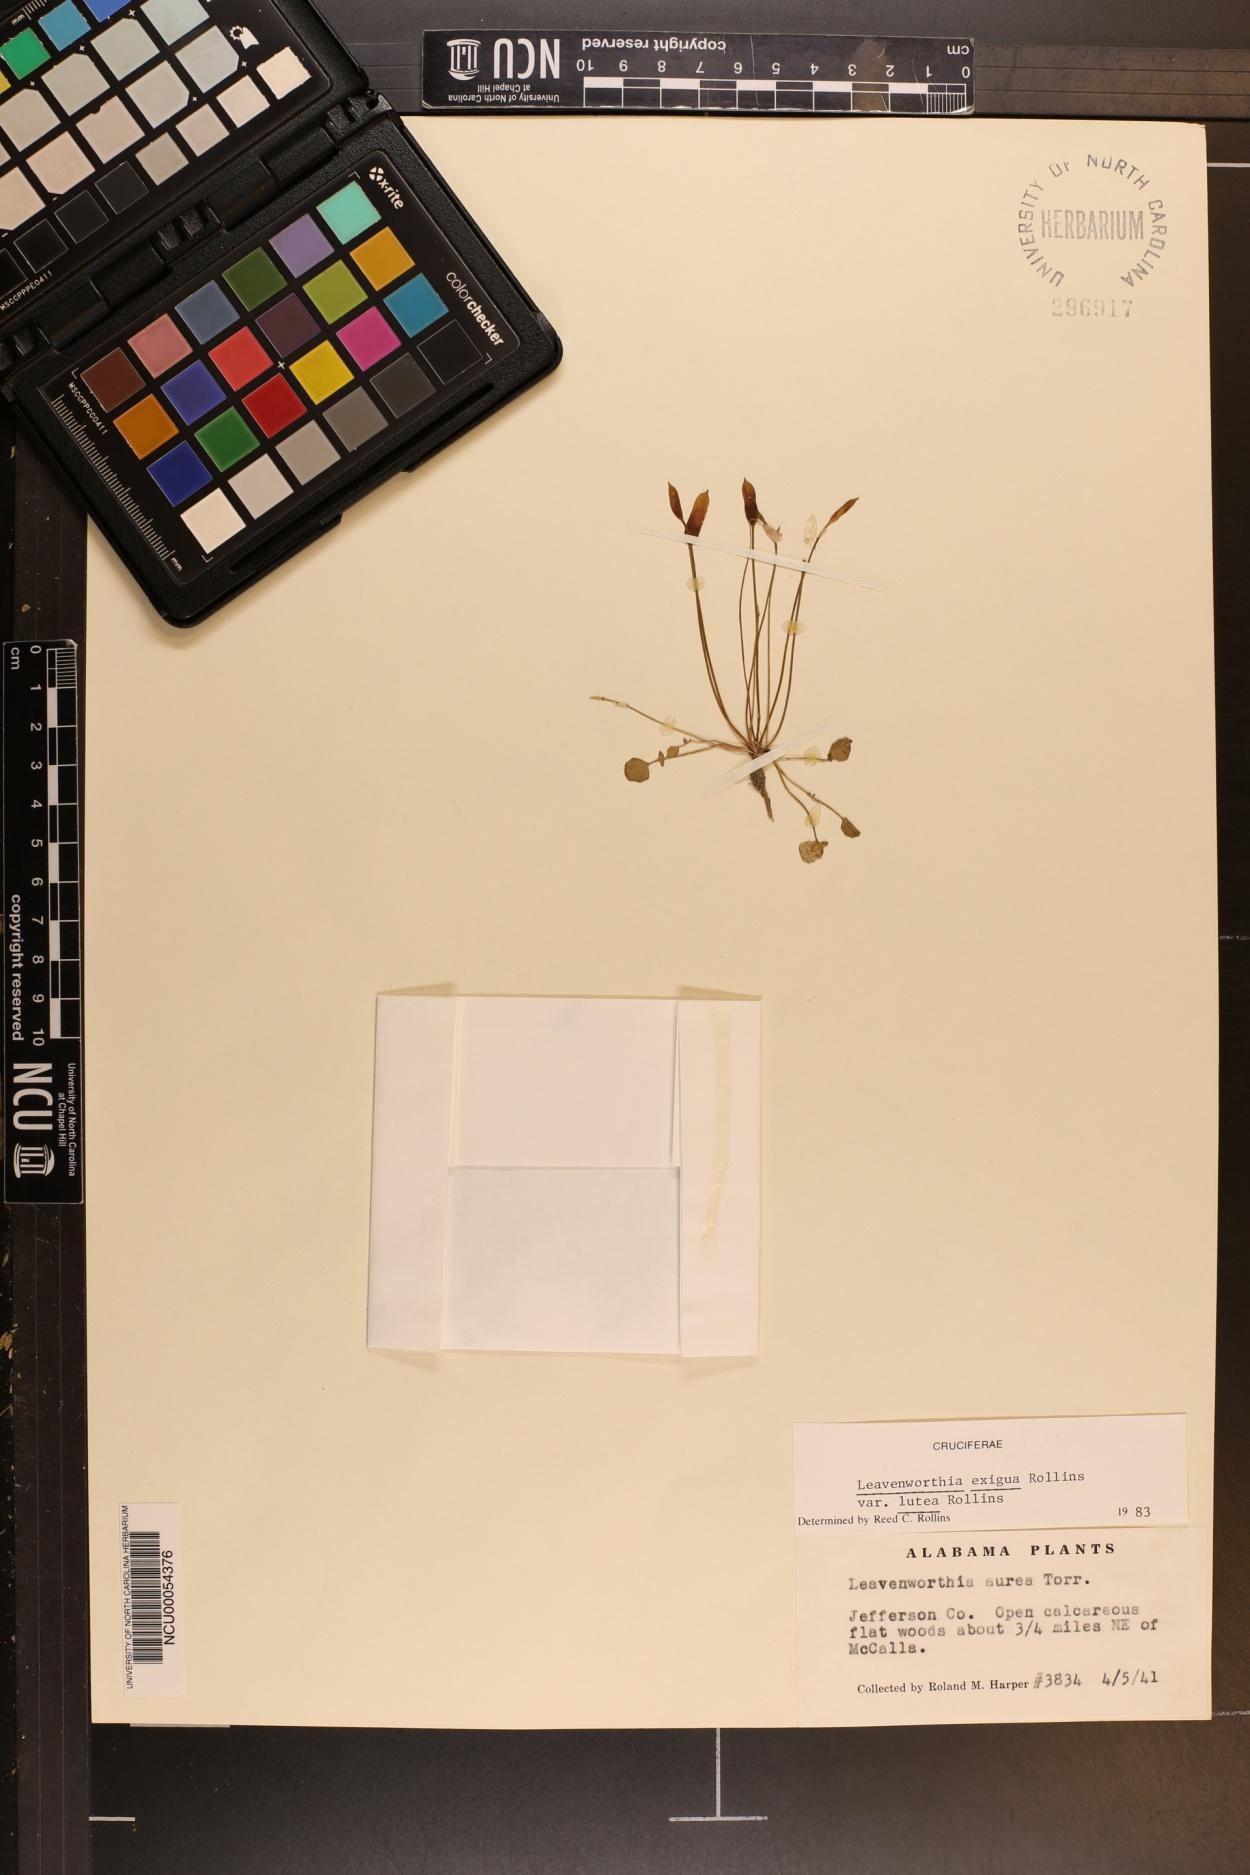 Leavenworthia exigua var. lutea image